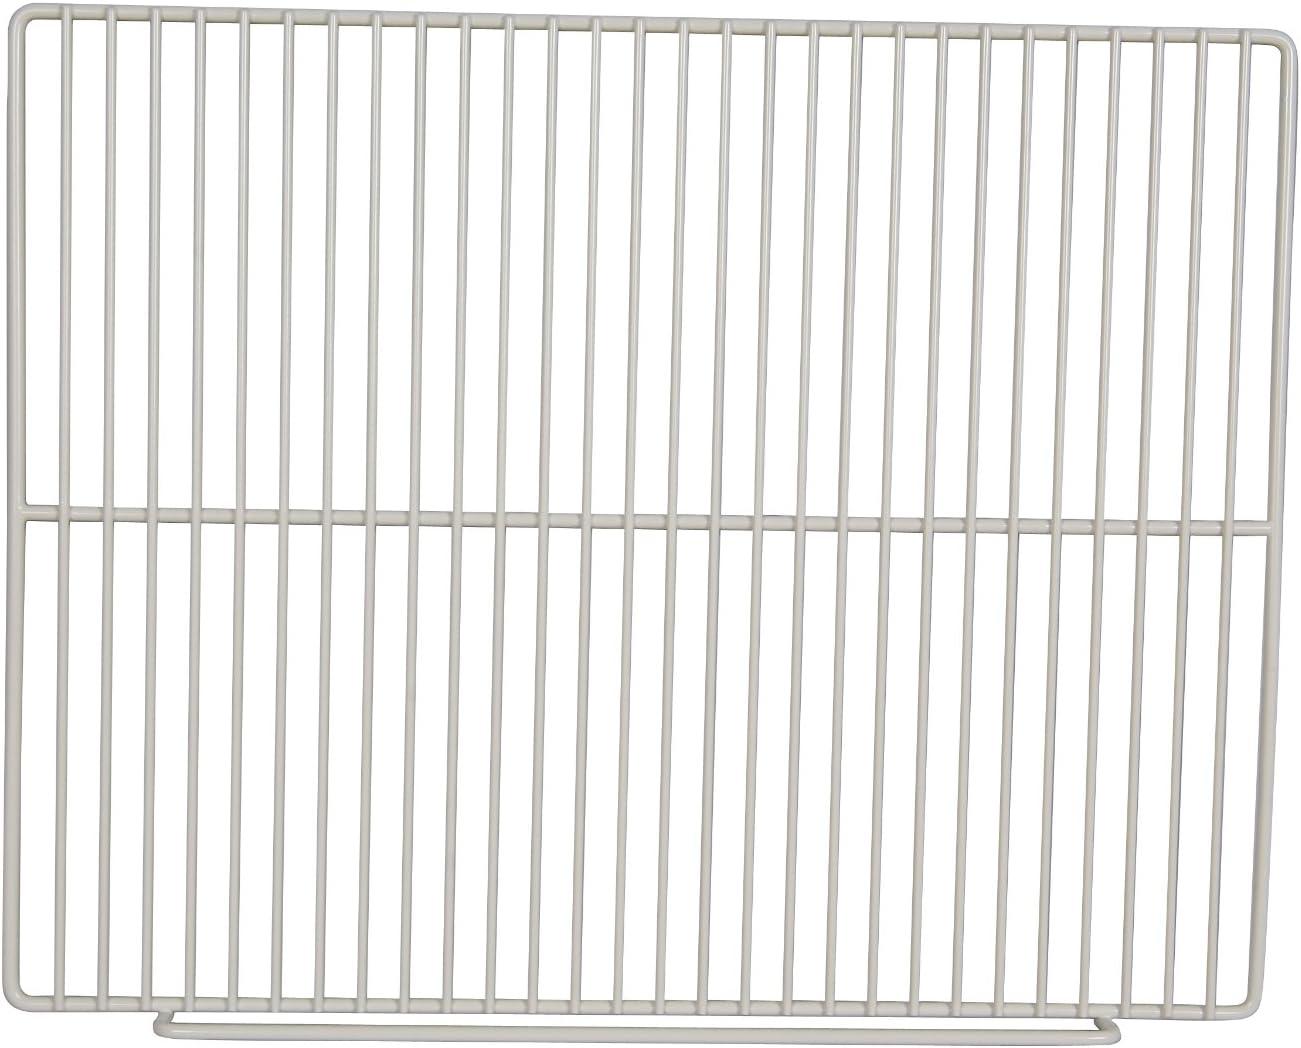 Beverage Air 403-826B Epoxy Coated Wire Shelf